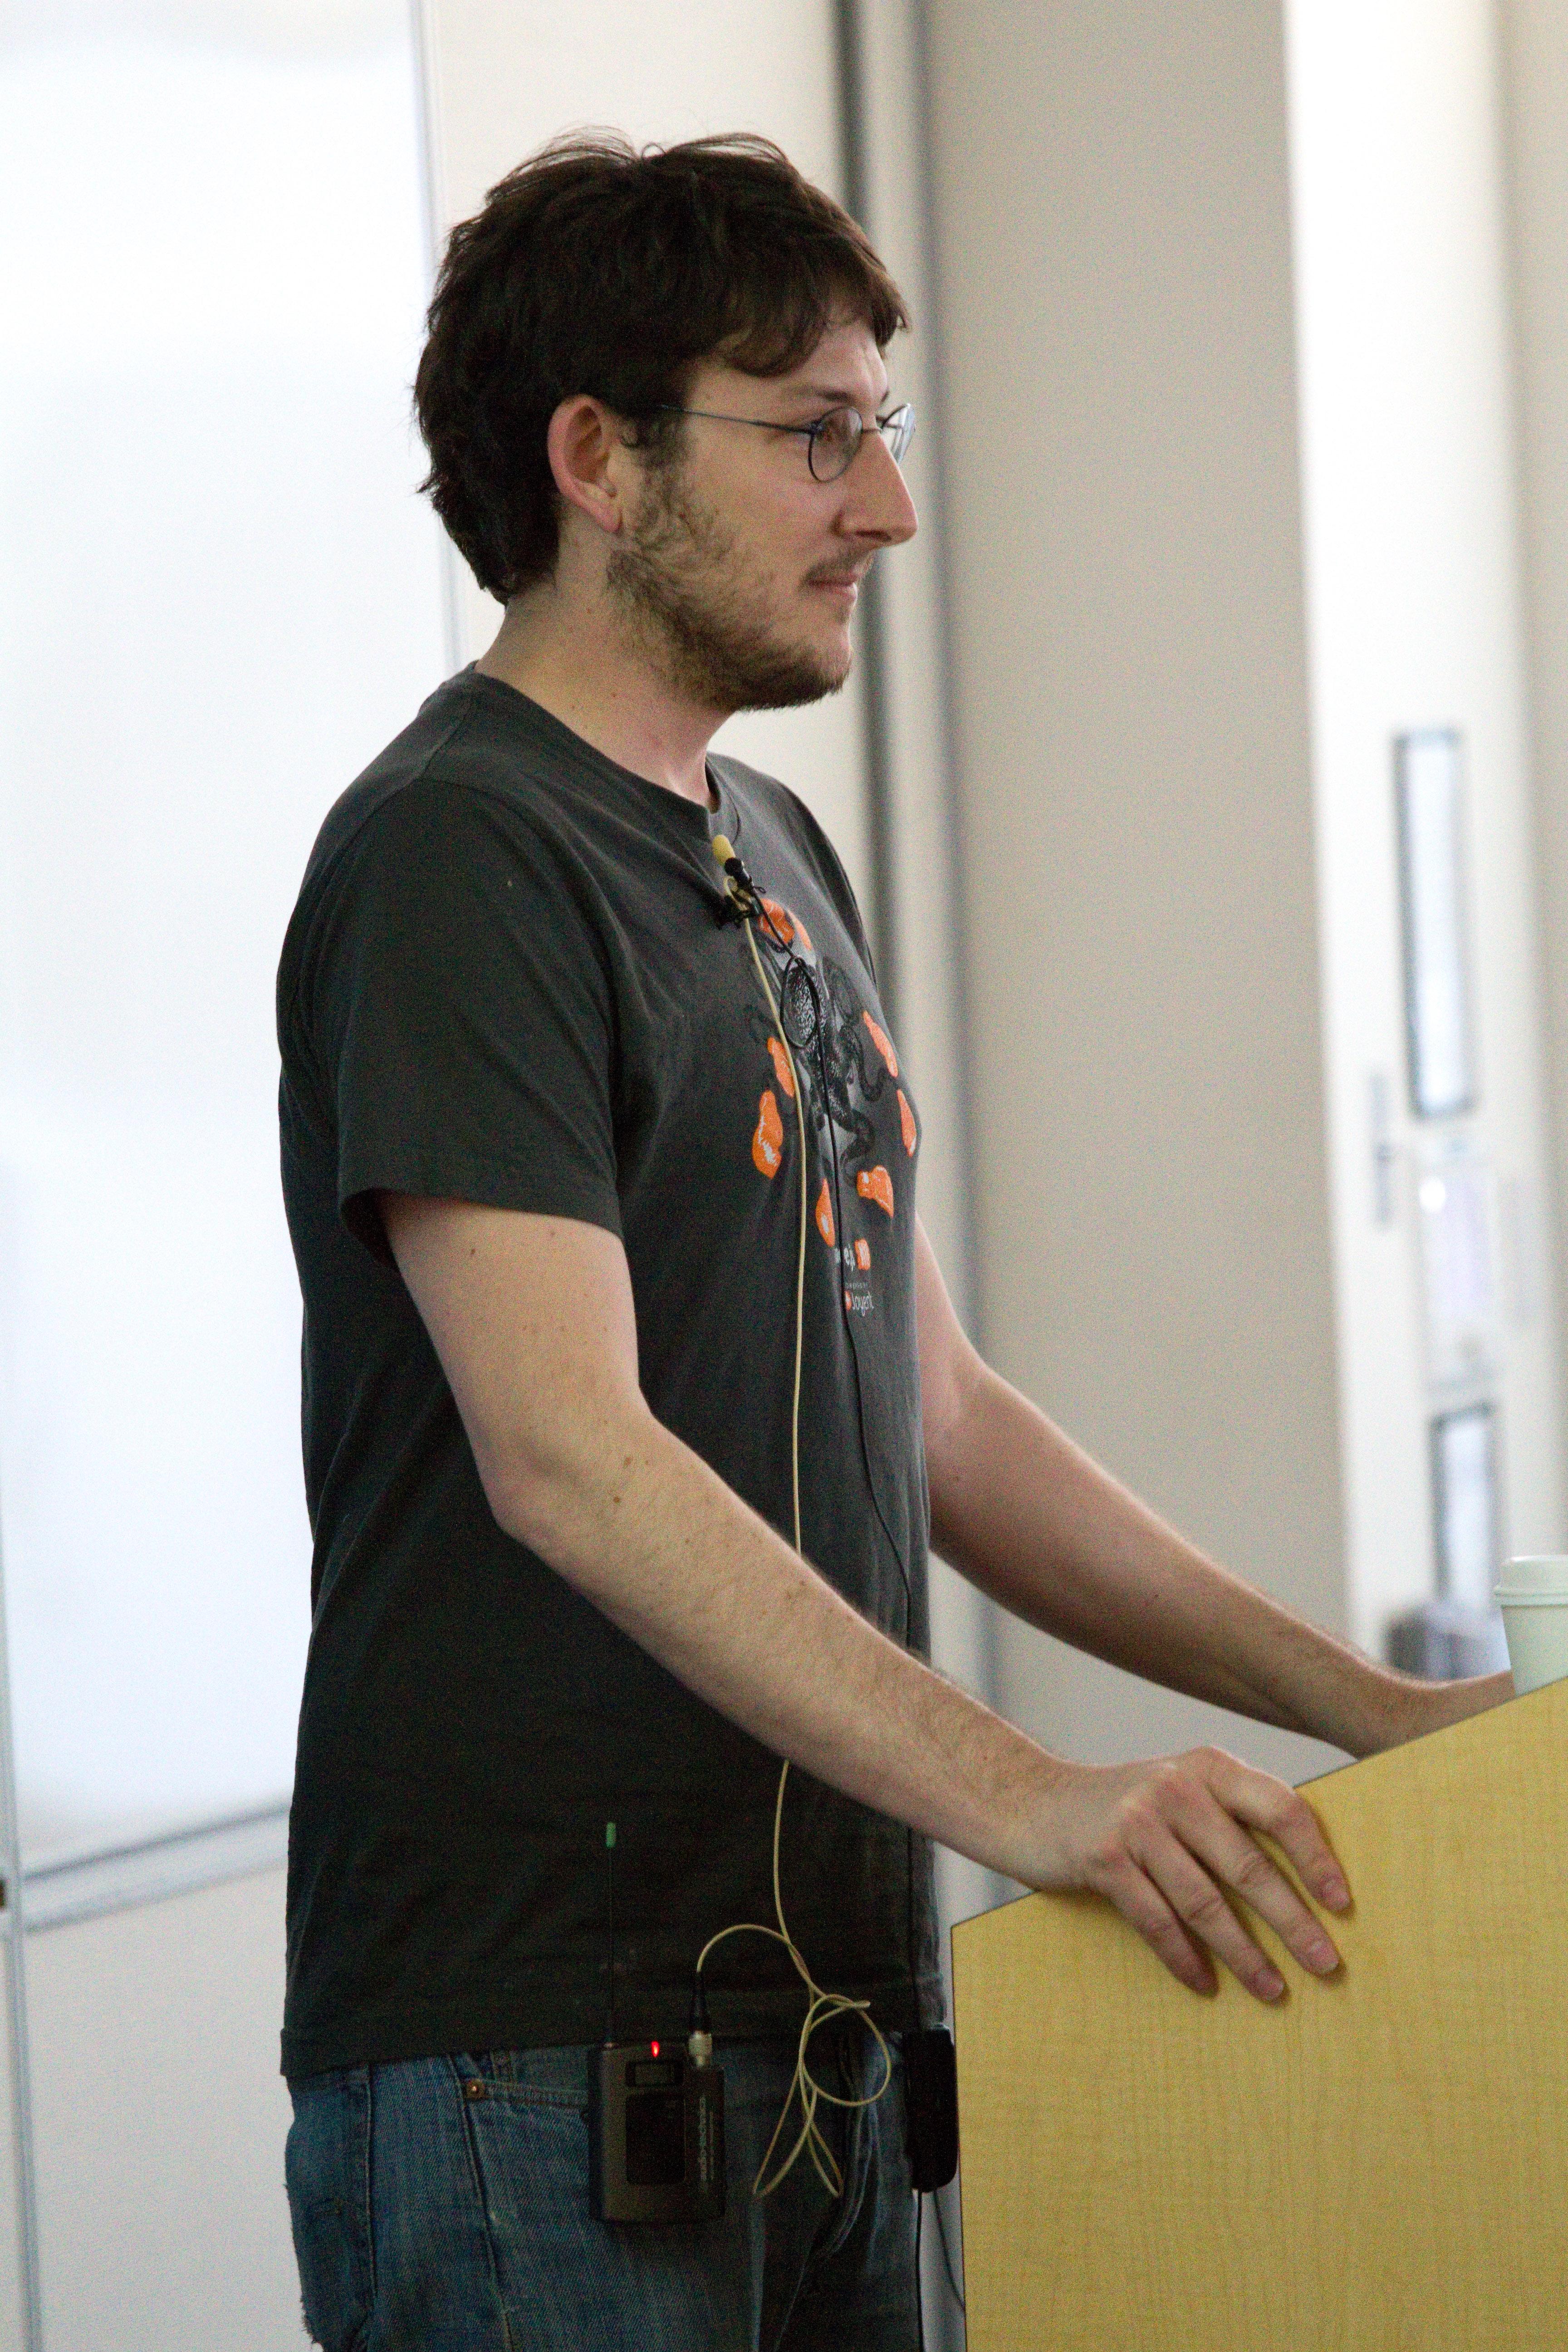 Ryan Dahl, creator of Node.js